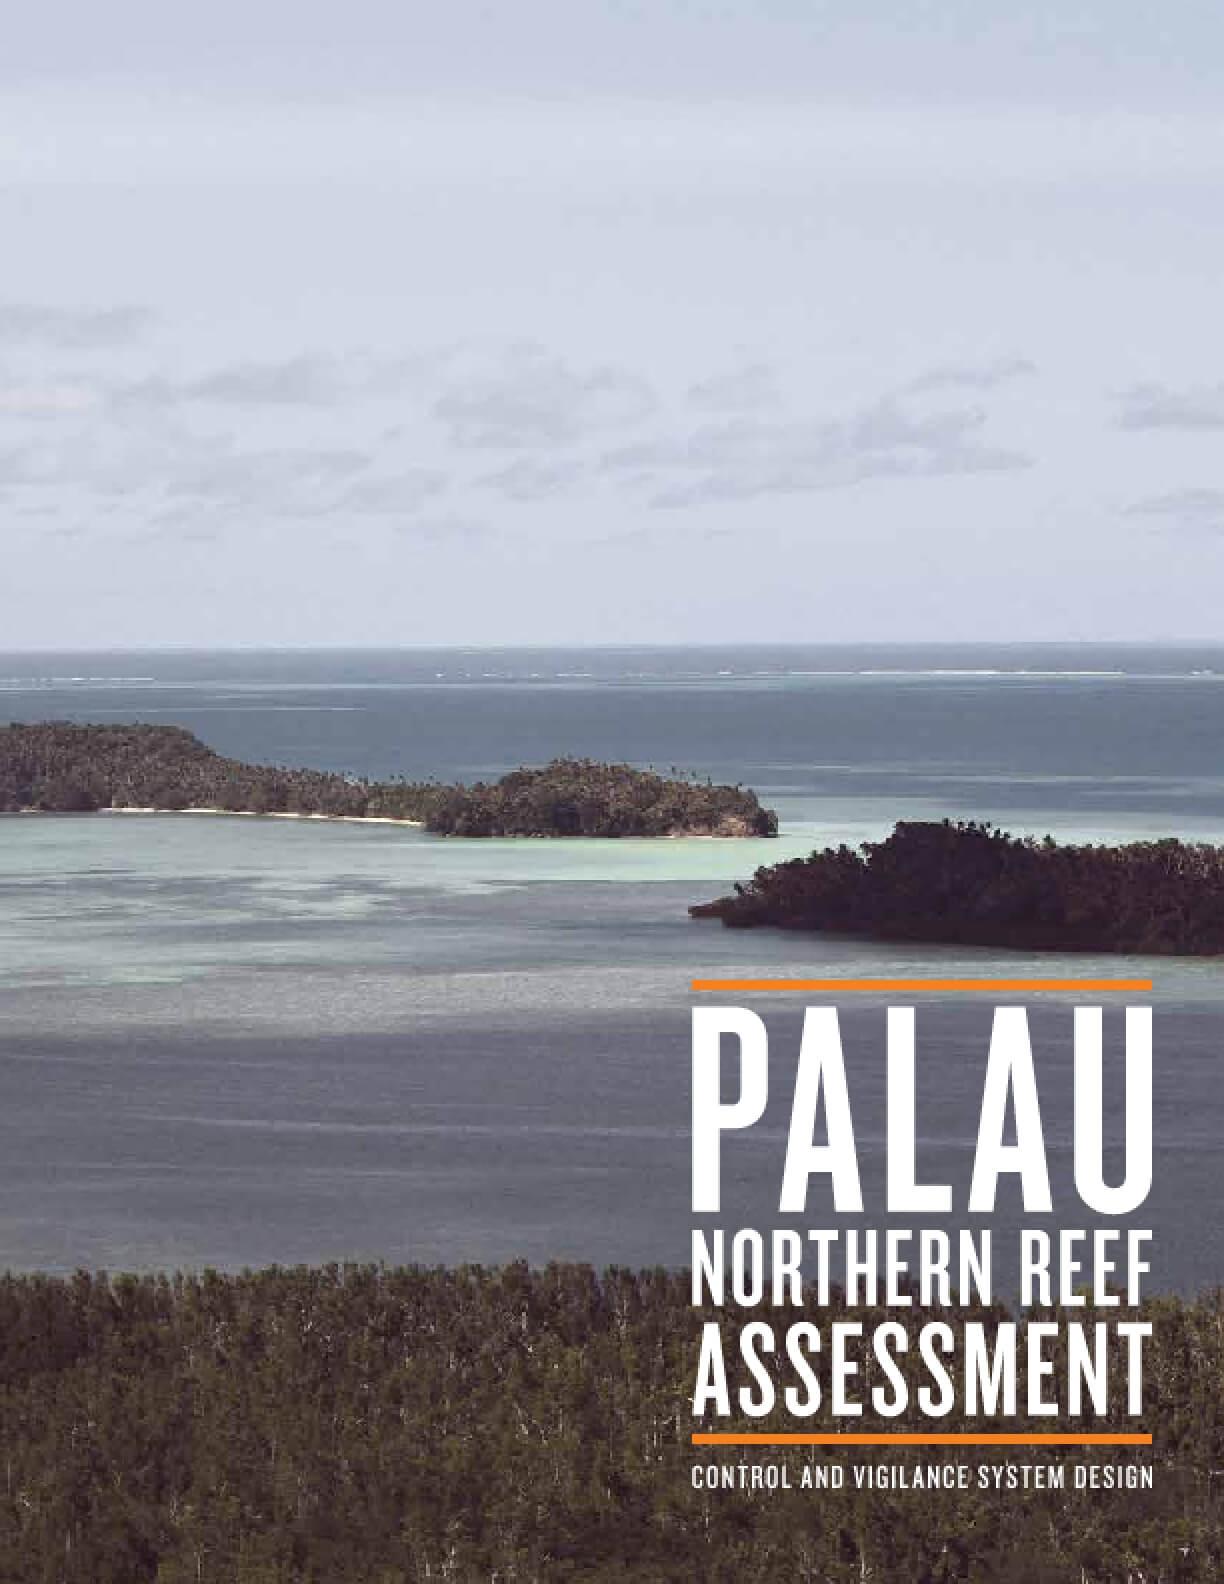 Palau Northern Reef Assessment: Control and Vigilance System Design